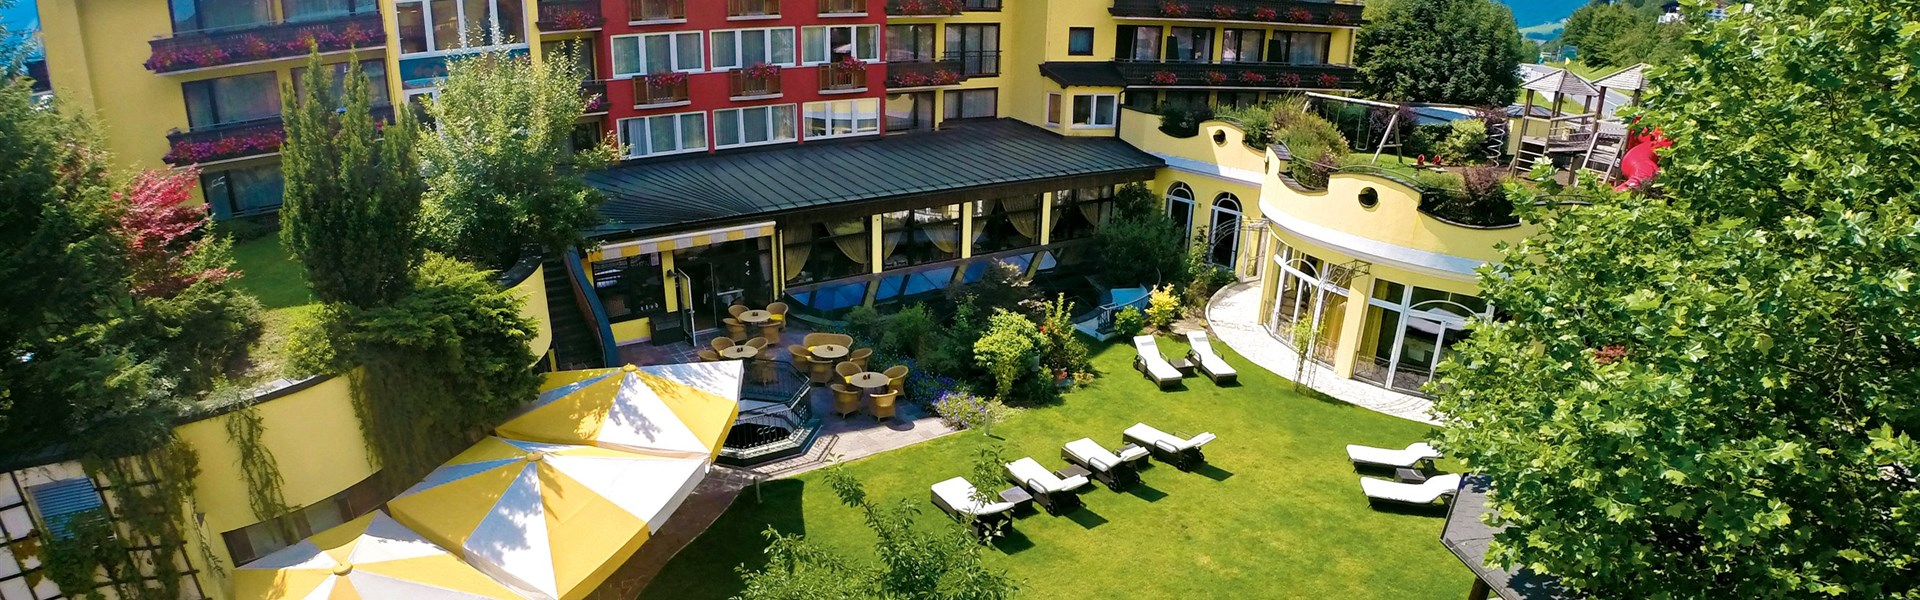 Hotel Latini -